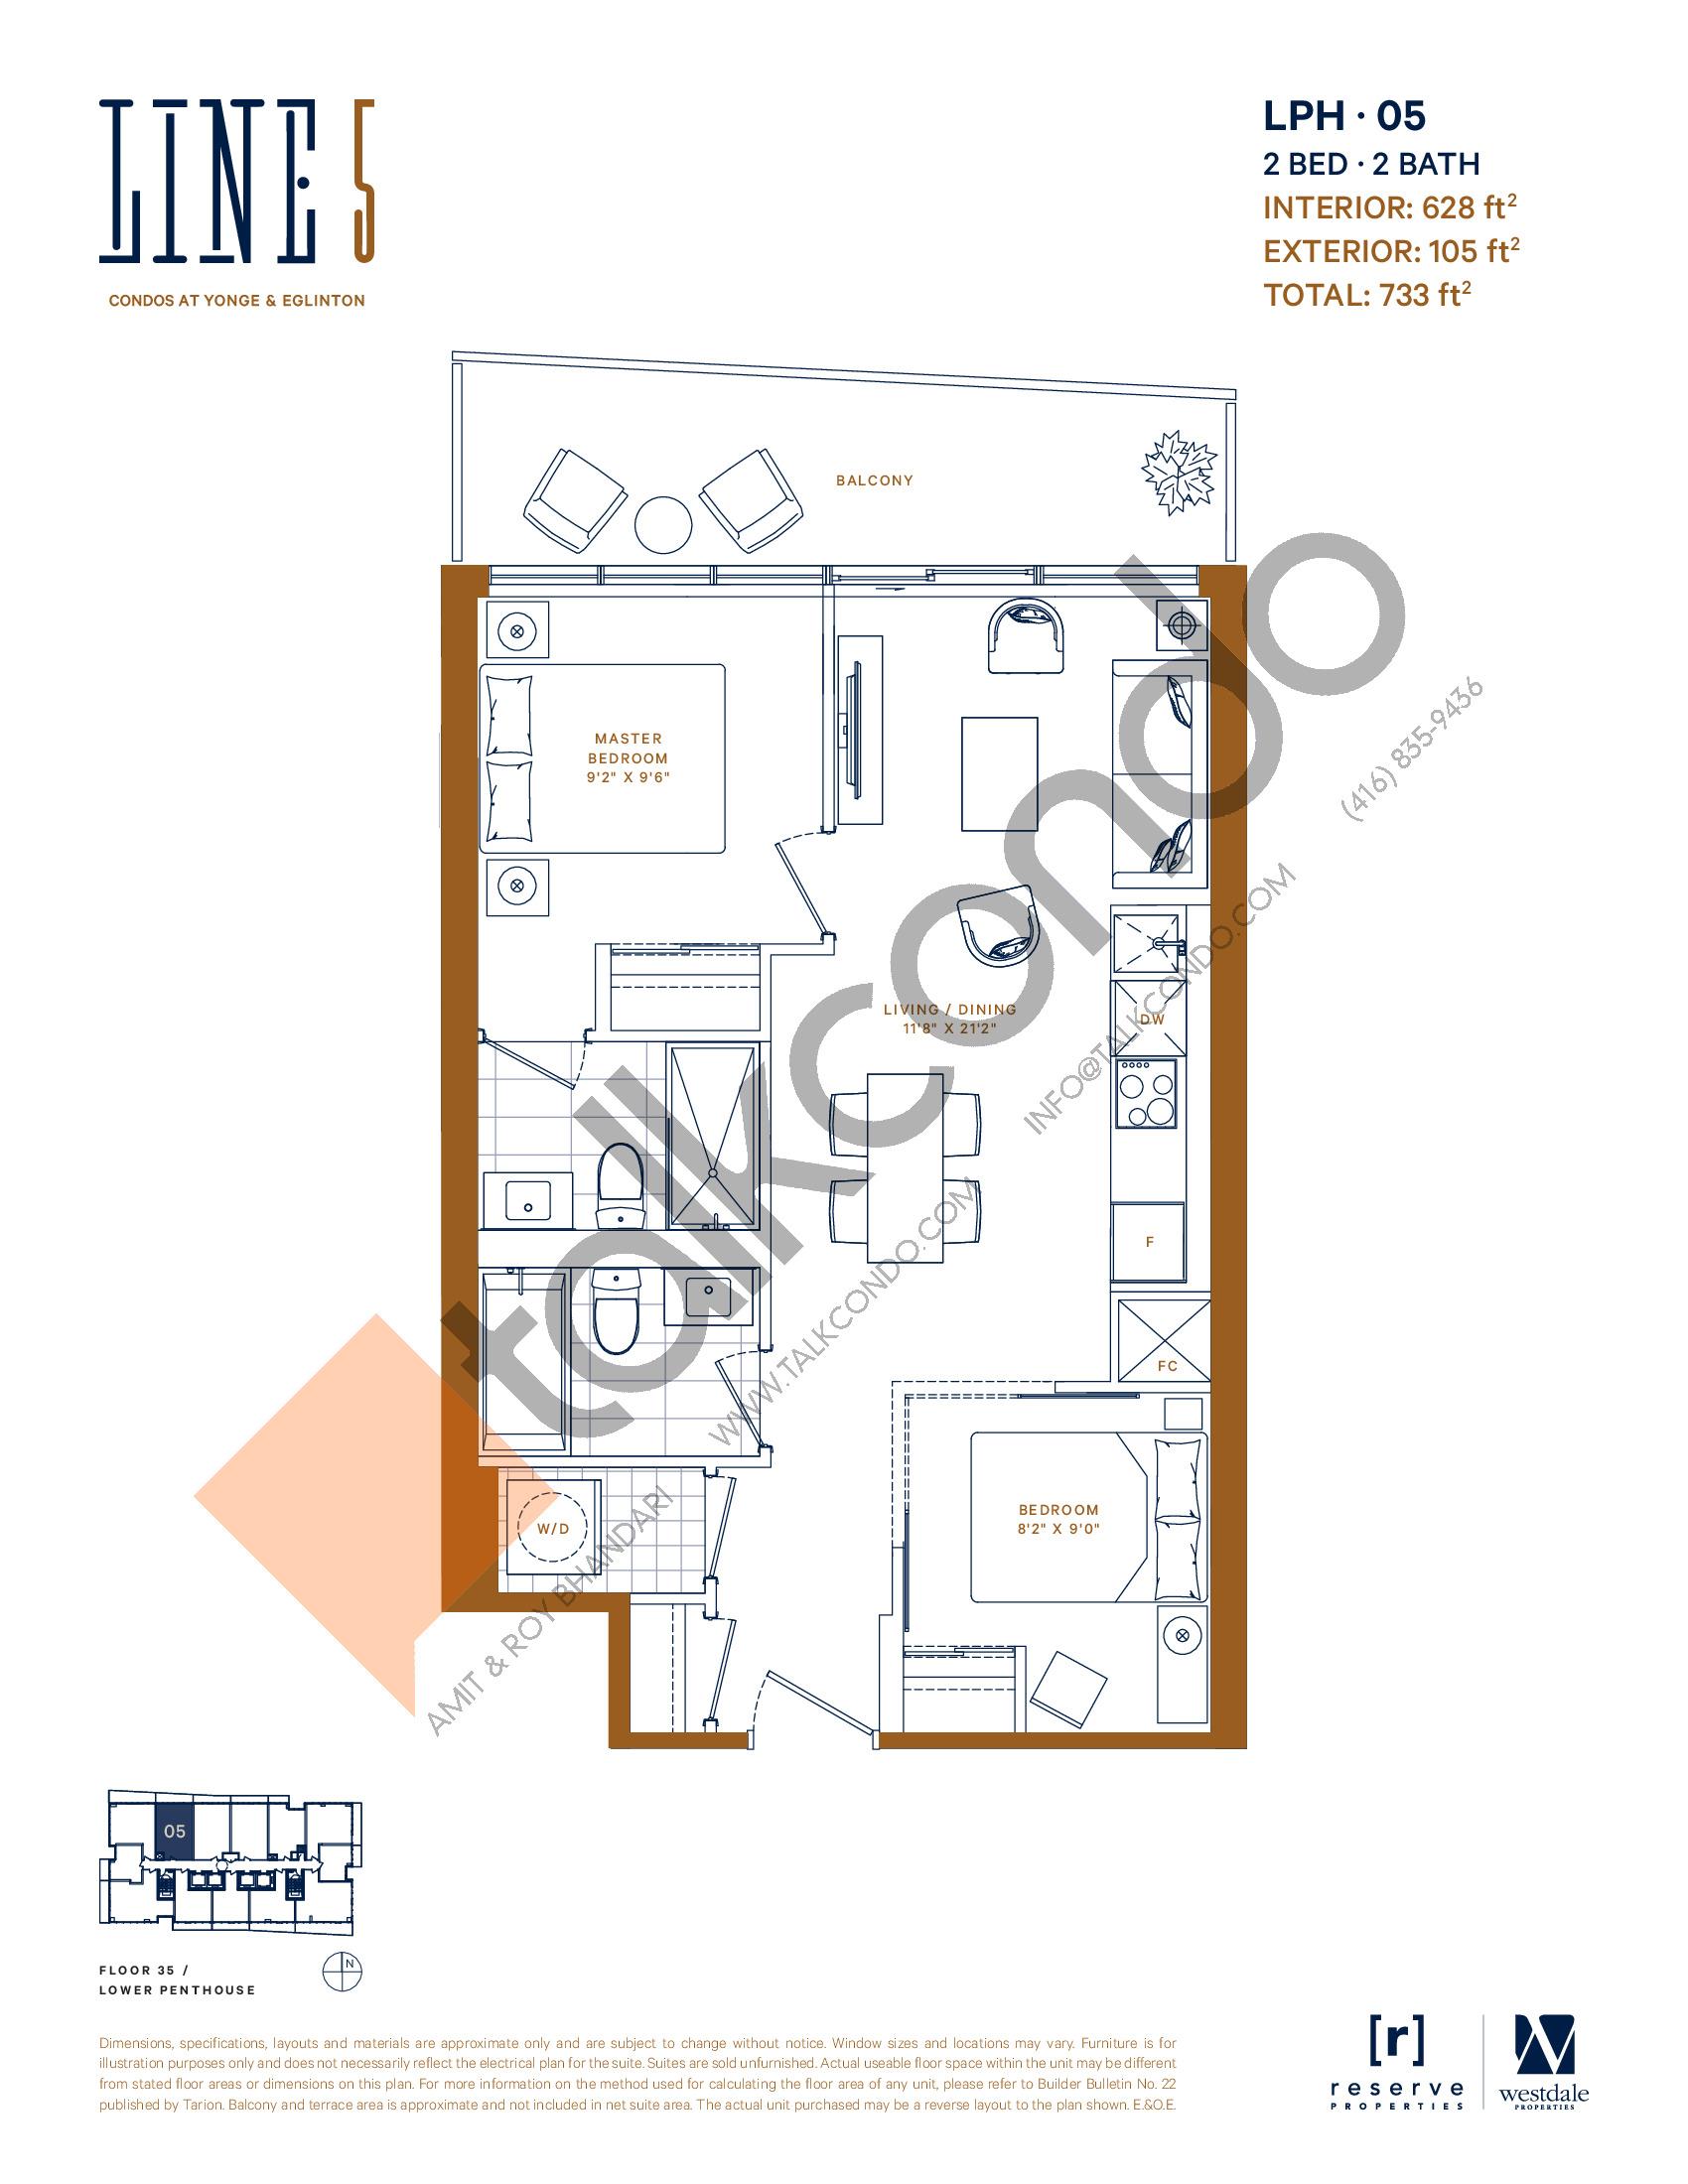 LPH-05 Floor Plan at Line 5 Condos - 628 sq.ft